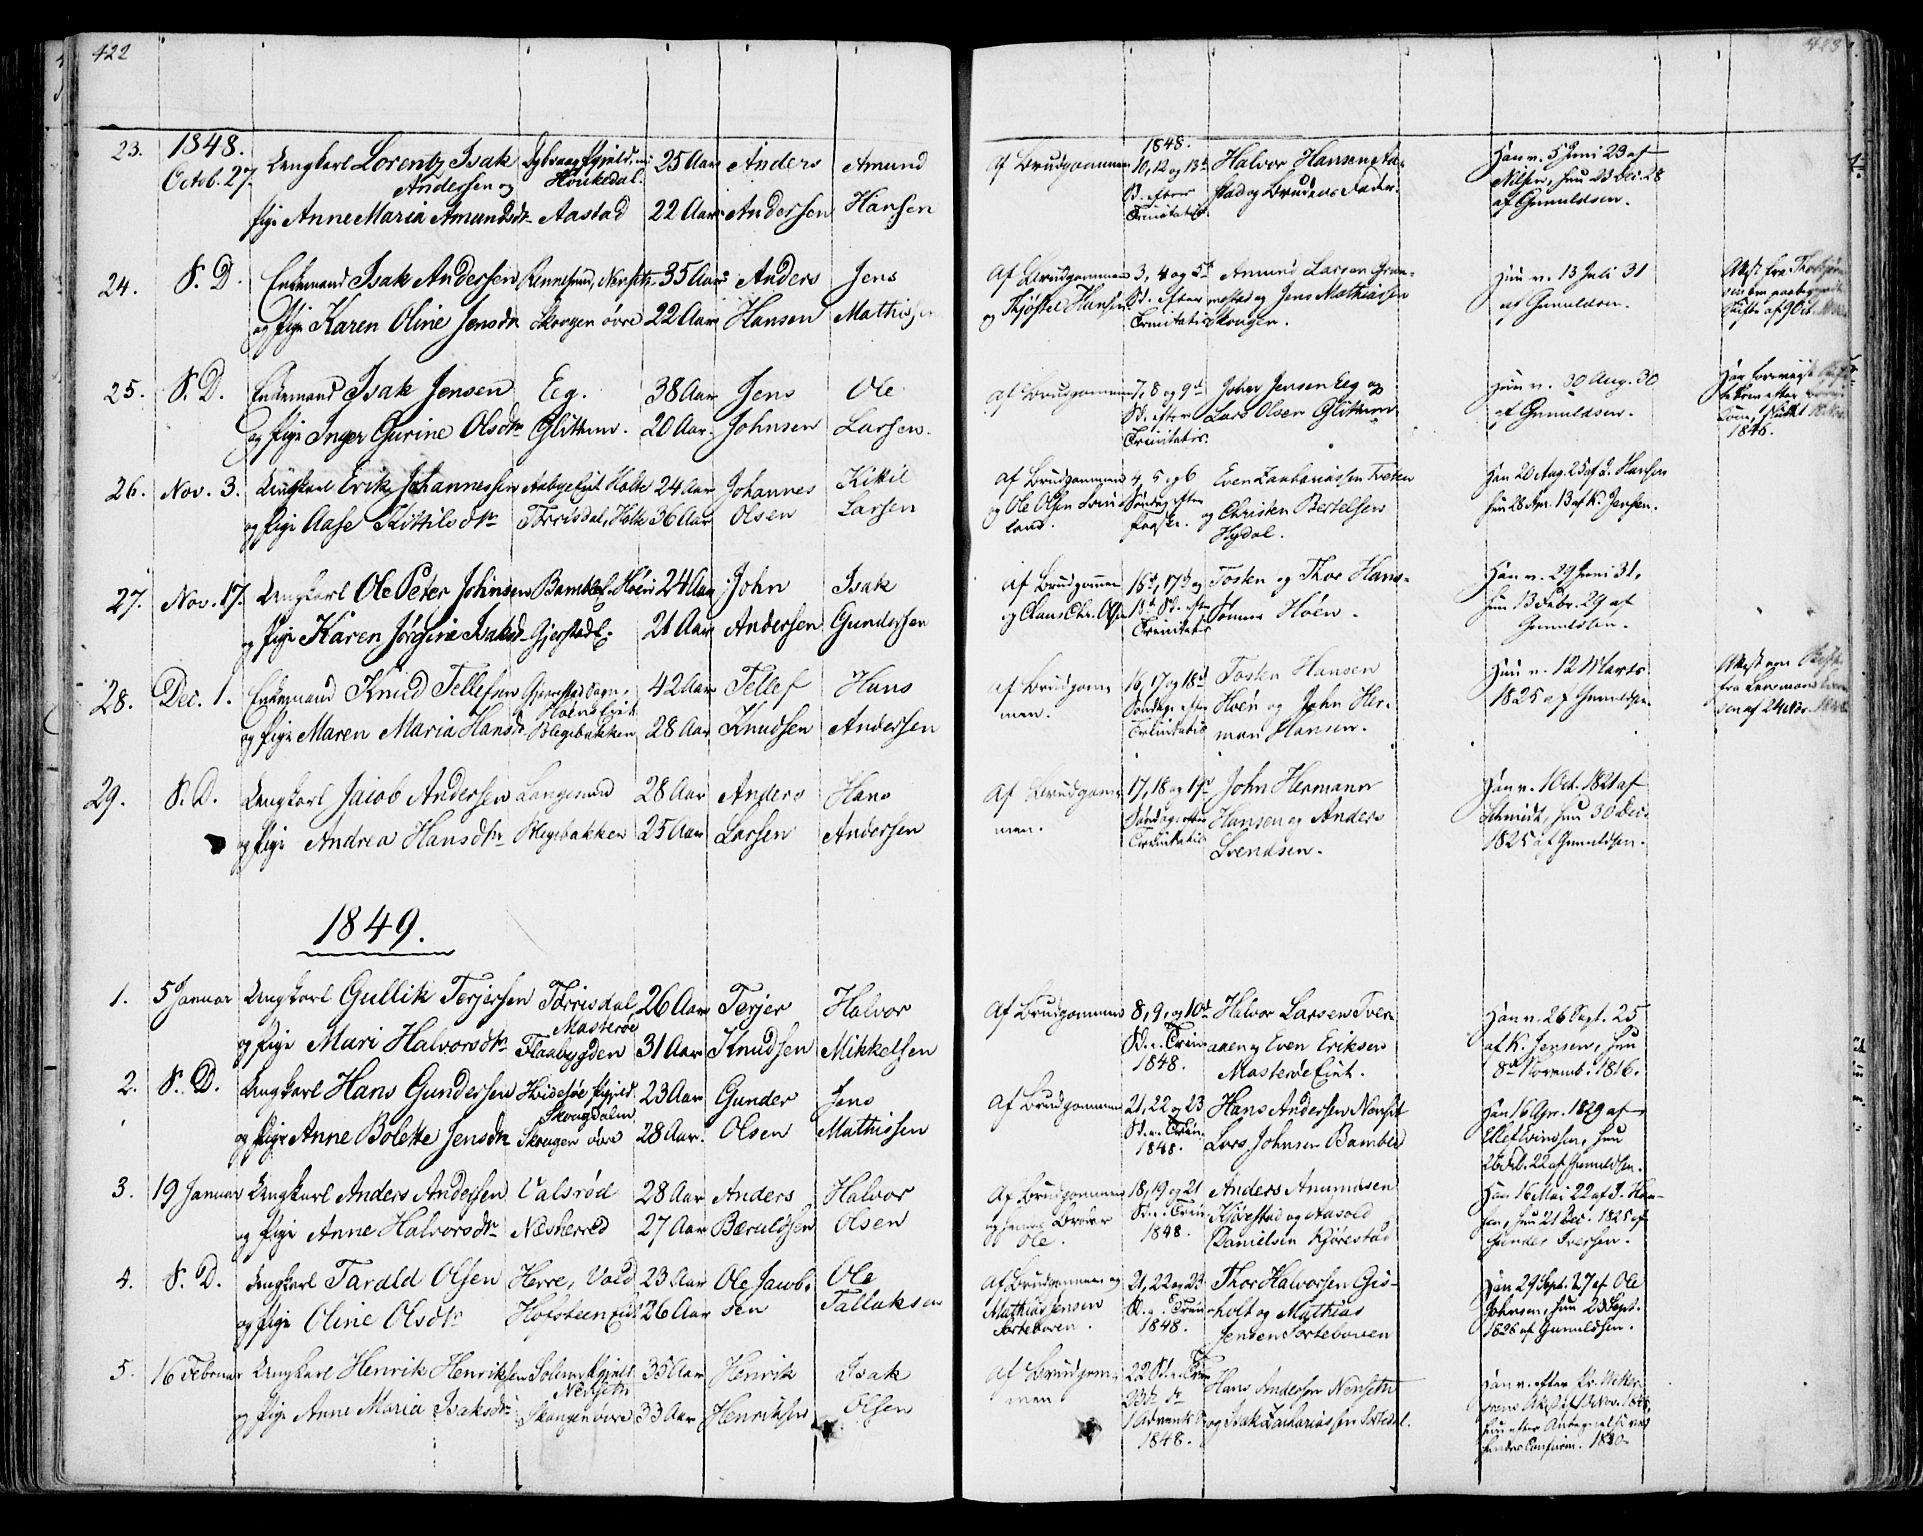 SAKO, Bamble kirkebøker, F/Fa/L0004: Ministerialbok nr. I 4, 1834-1853, s. 422-423